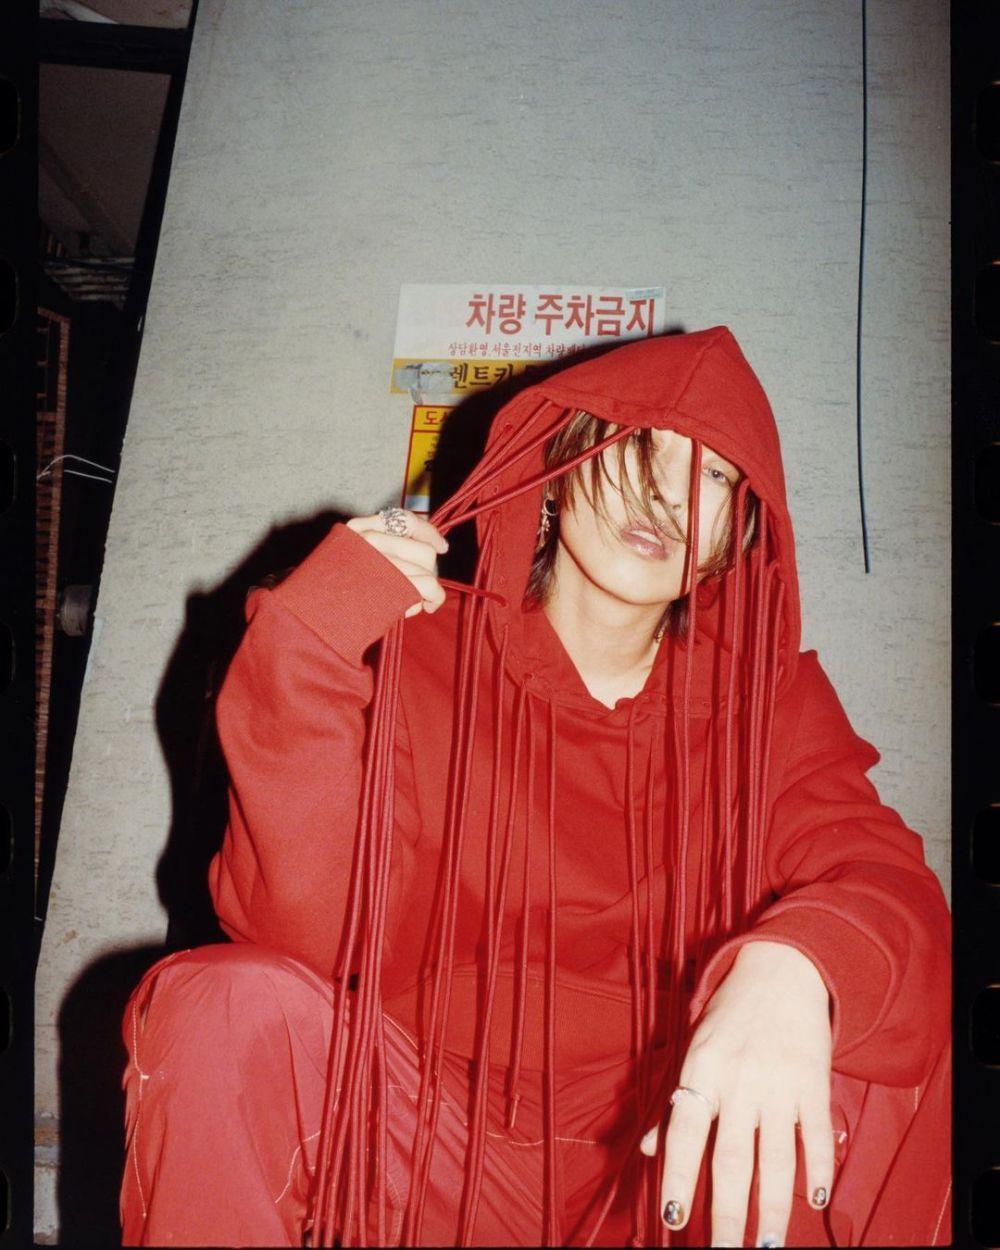 10 Fakta Menarik DPR LIVE, Rapper Kece yang Kini Genap 28 Tahun